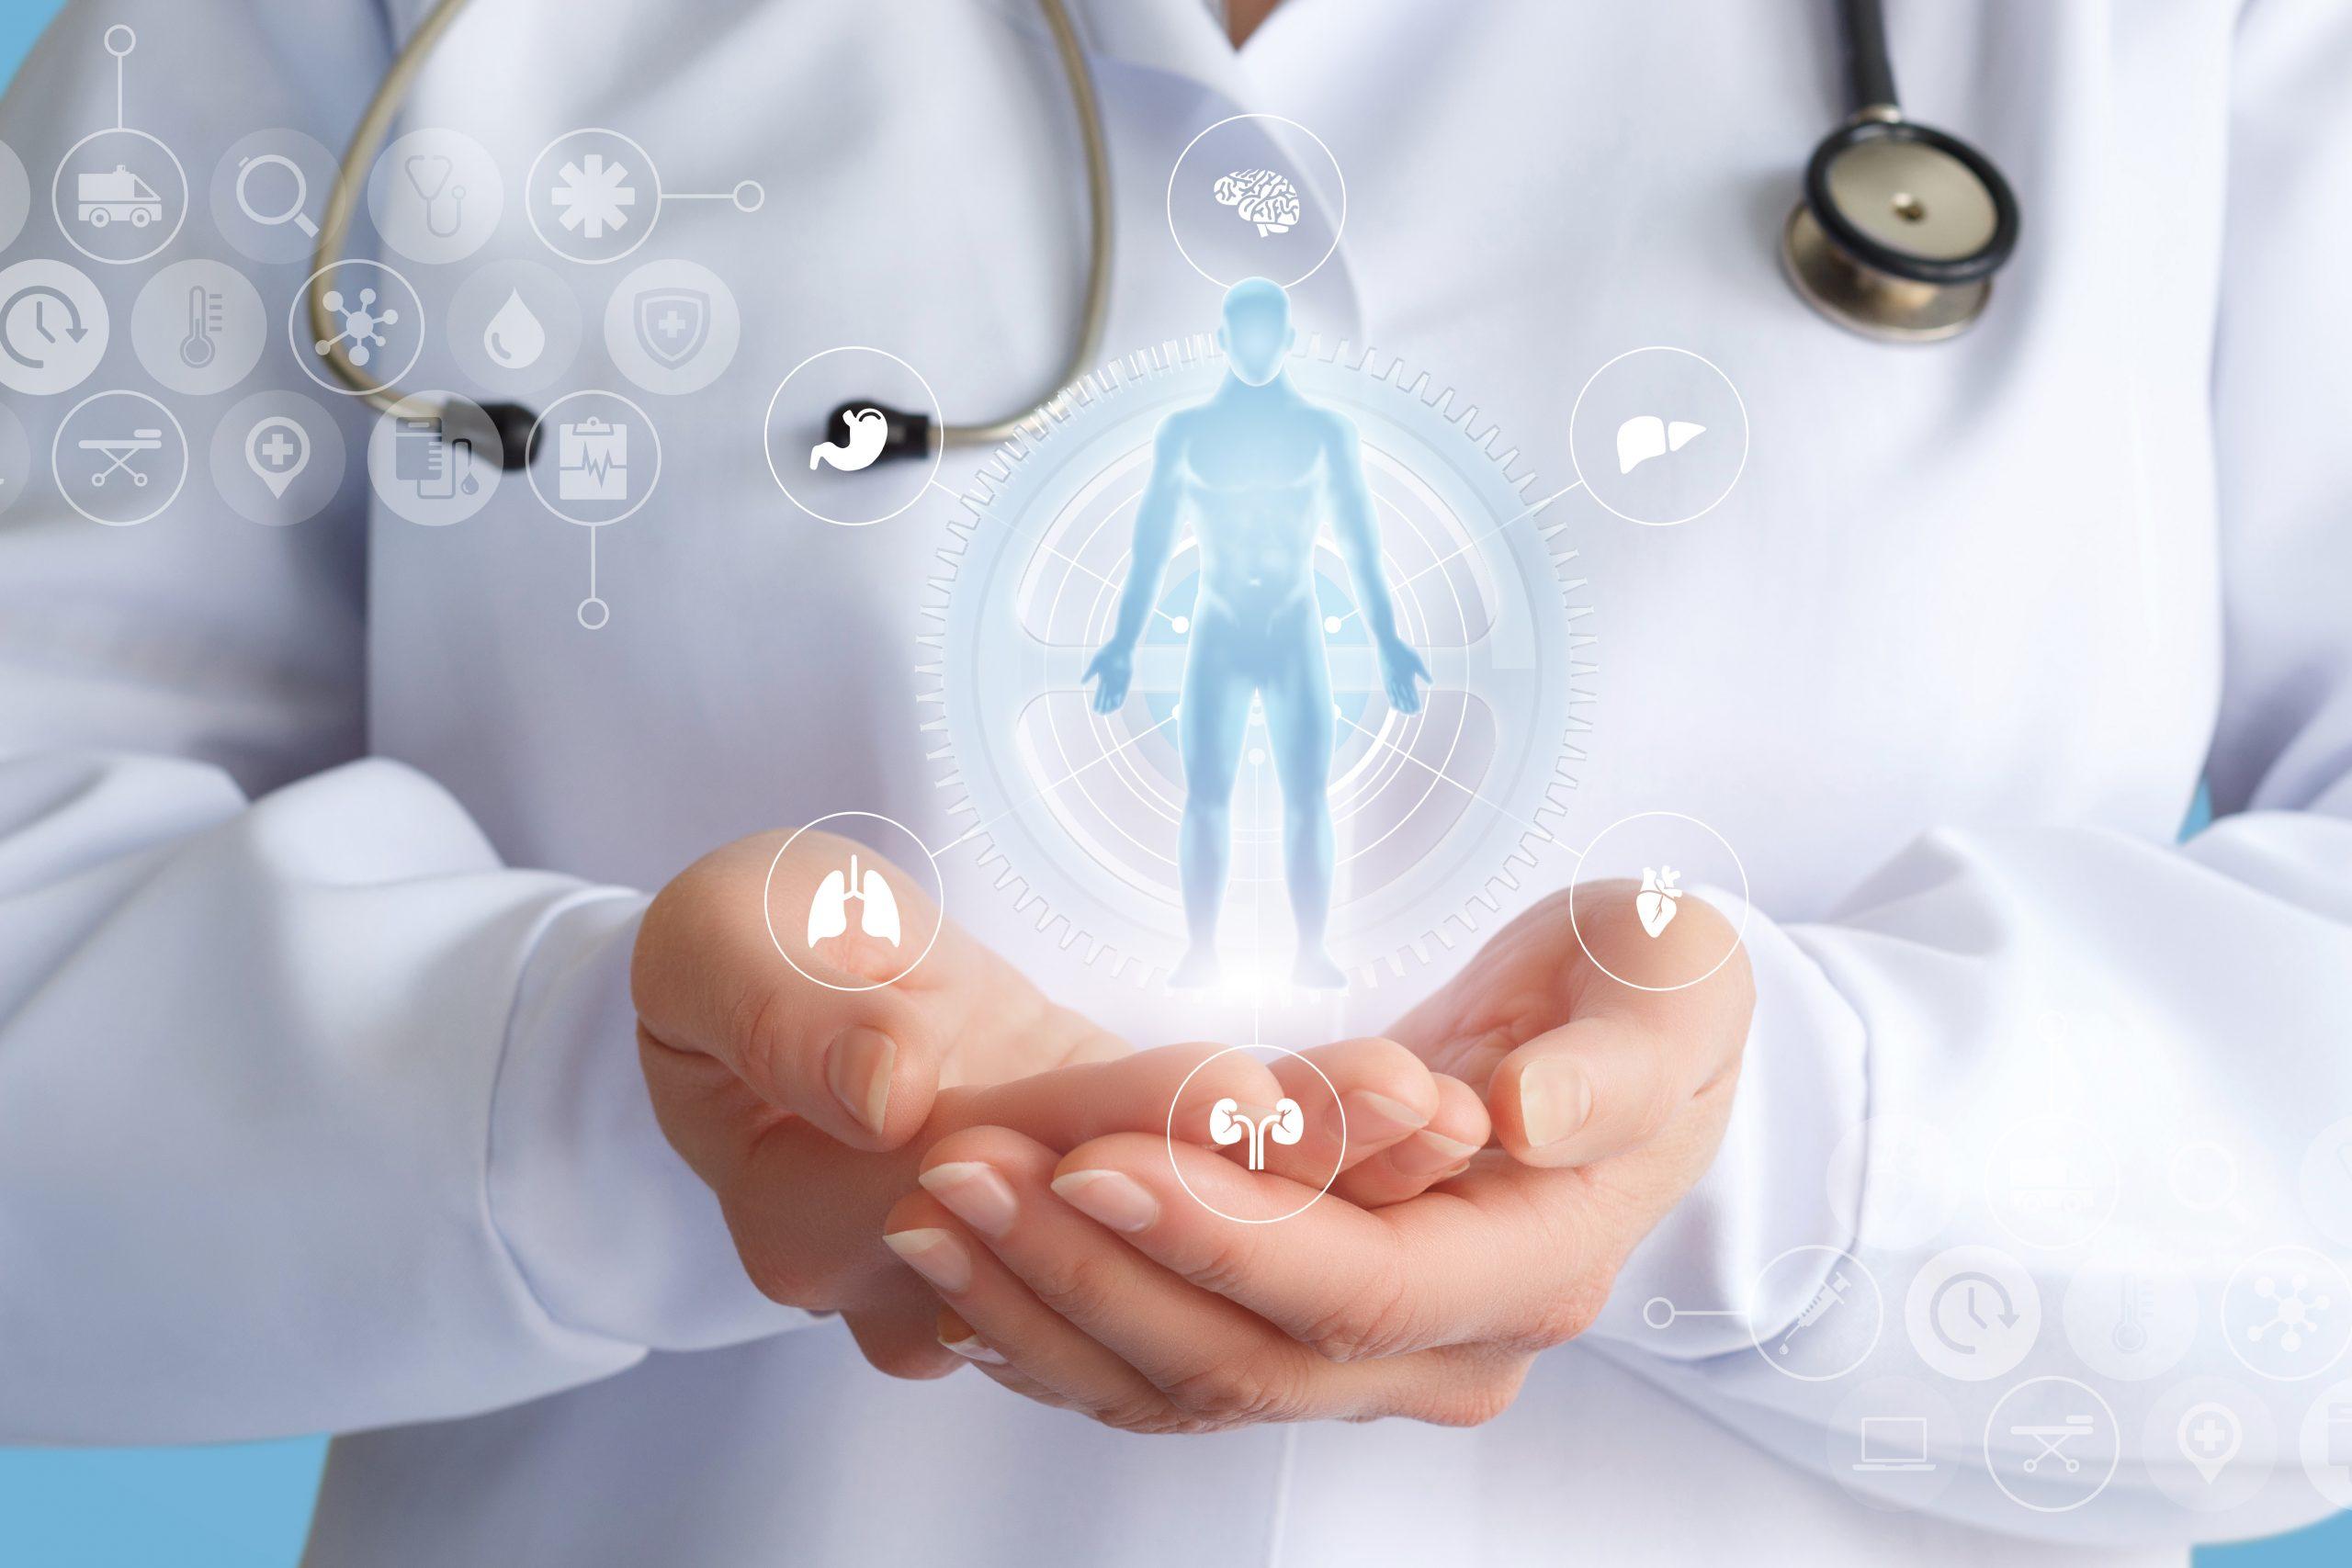 dr pop md medicine diabetes 189